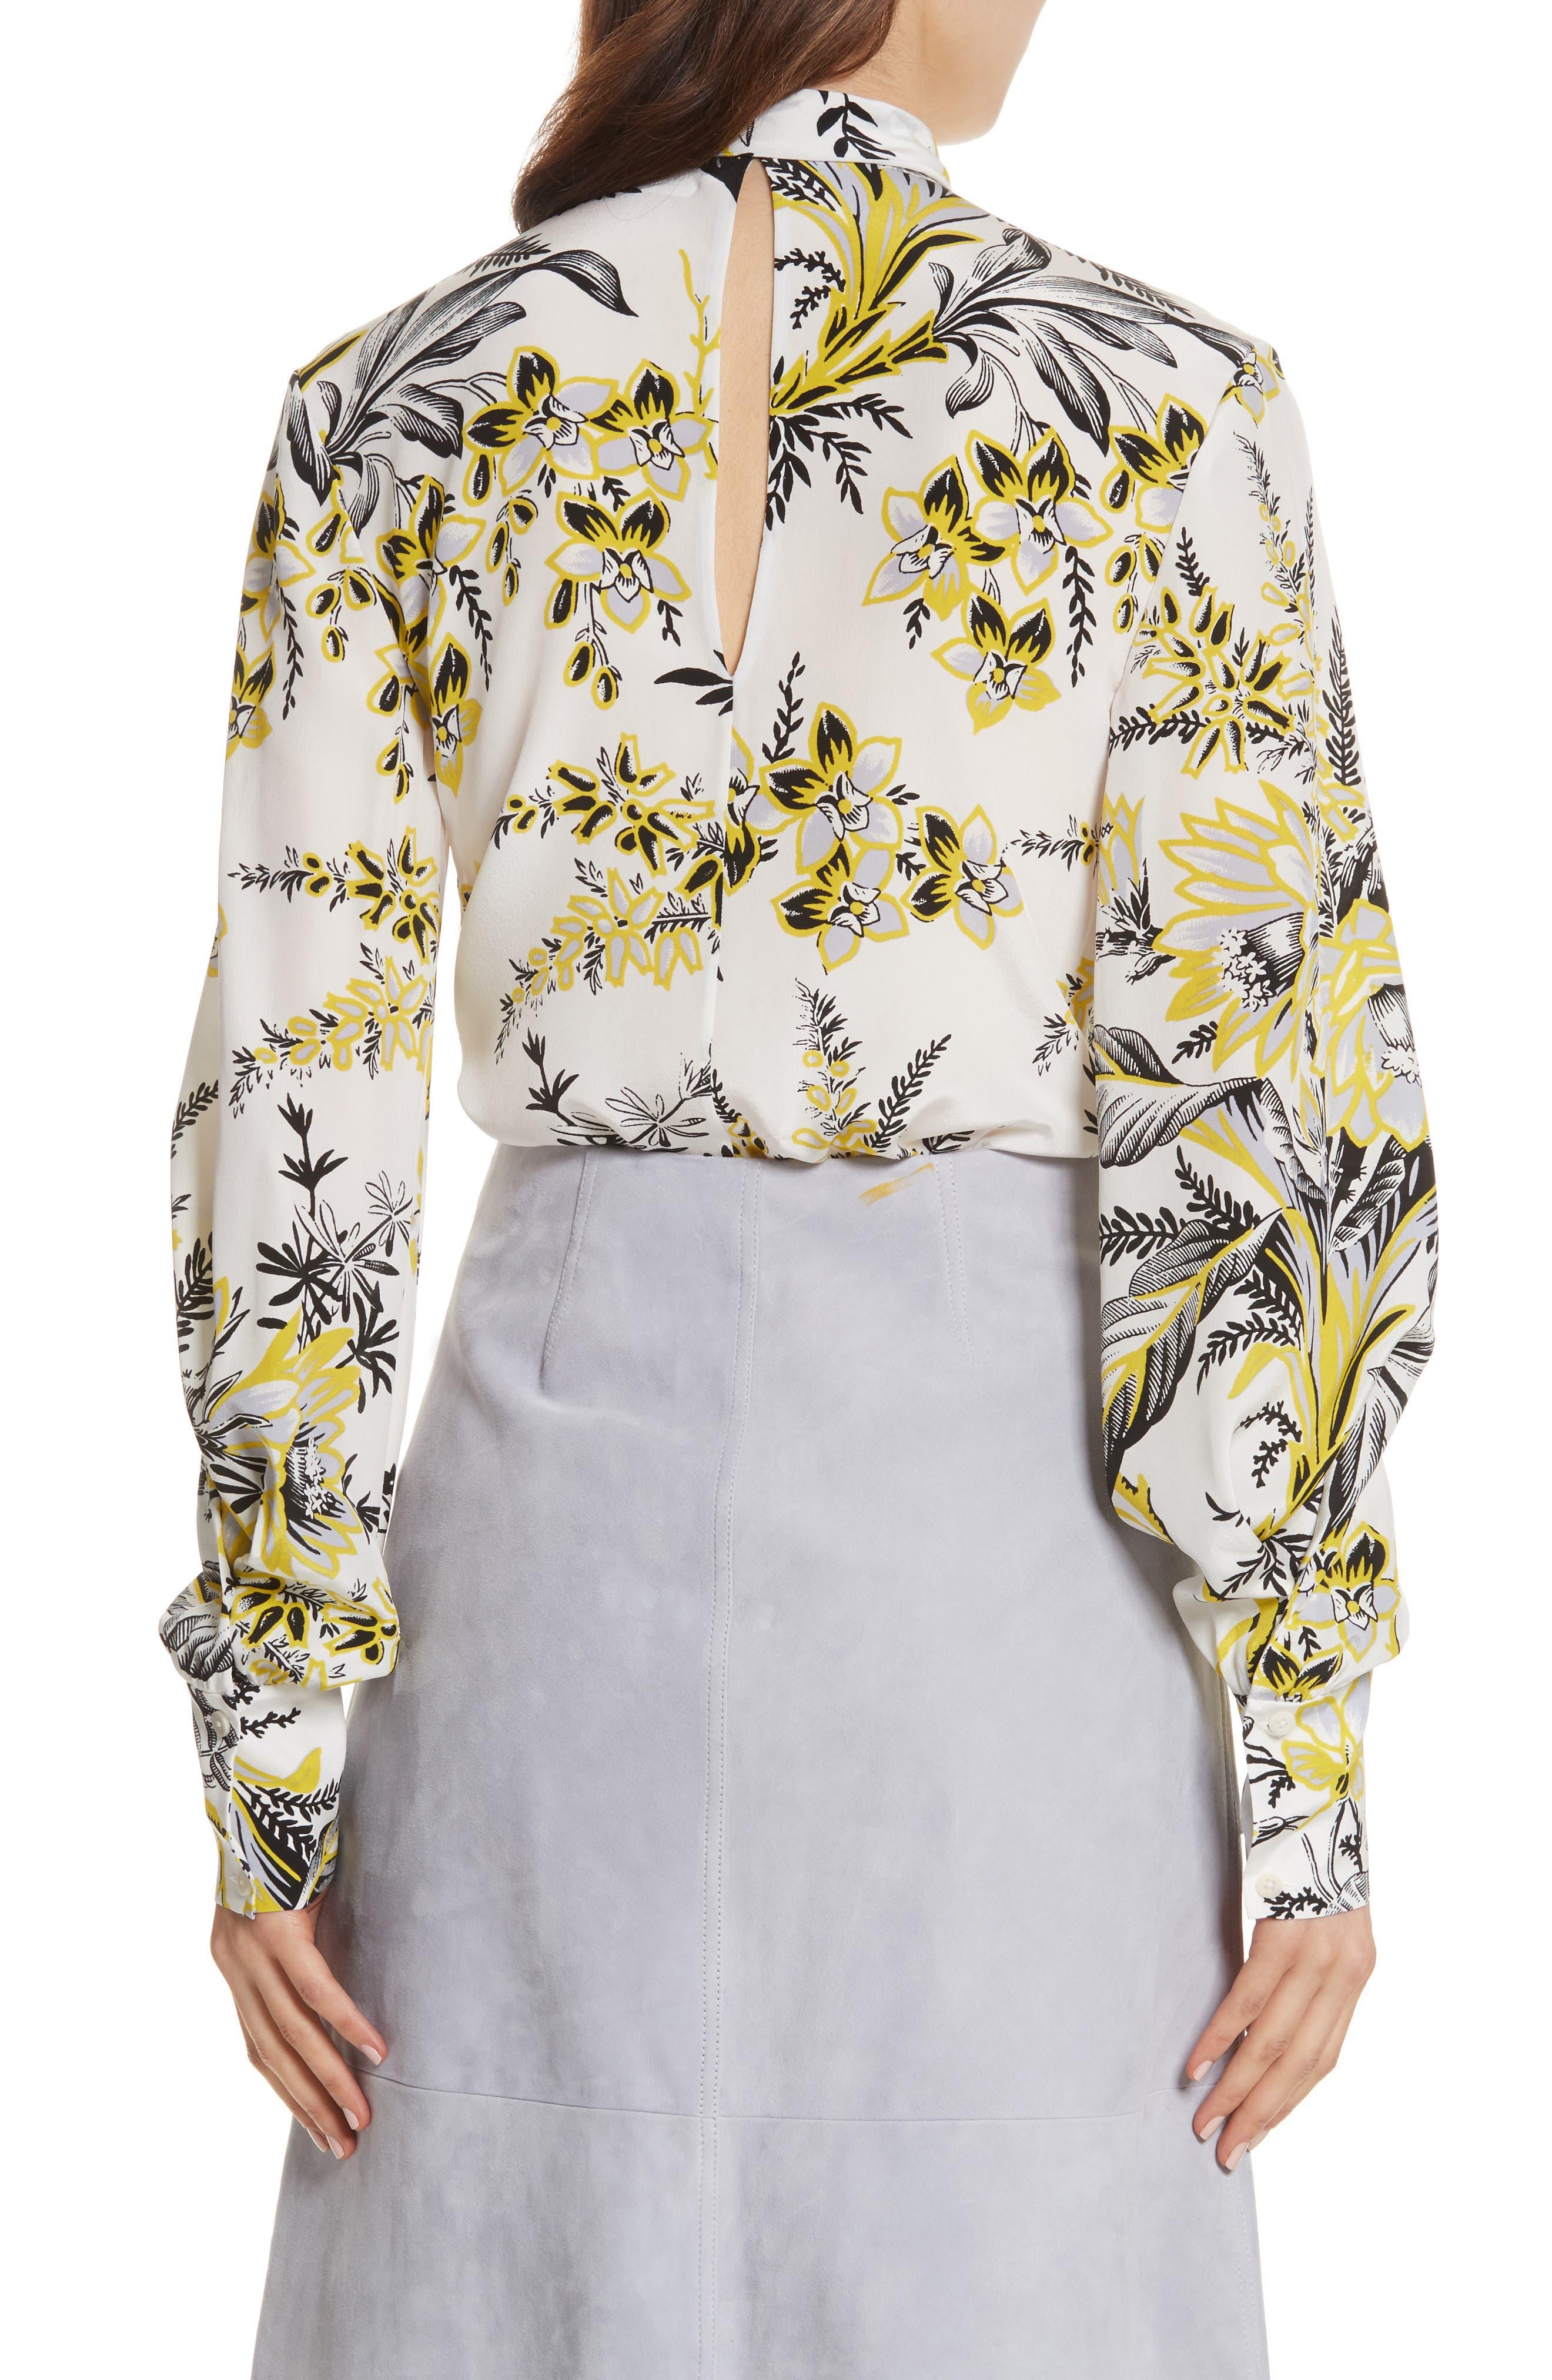 Diane von Furstenberg Tie Neck Silk Blouse,                             Alternate thumbnail 2, color,                             Avalon Ivory